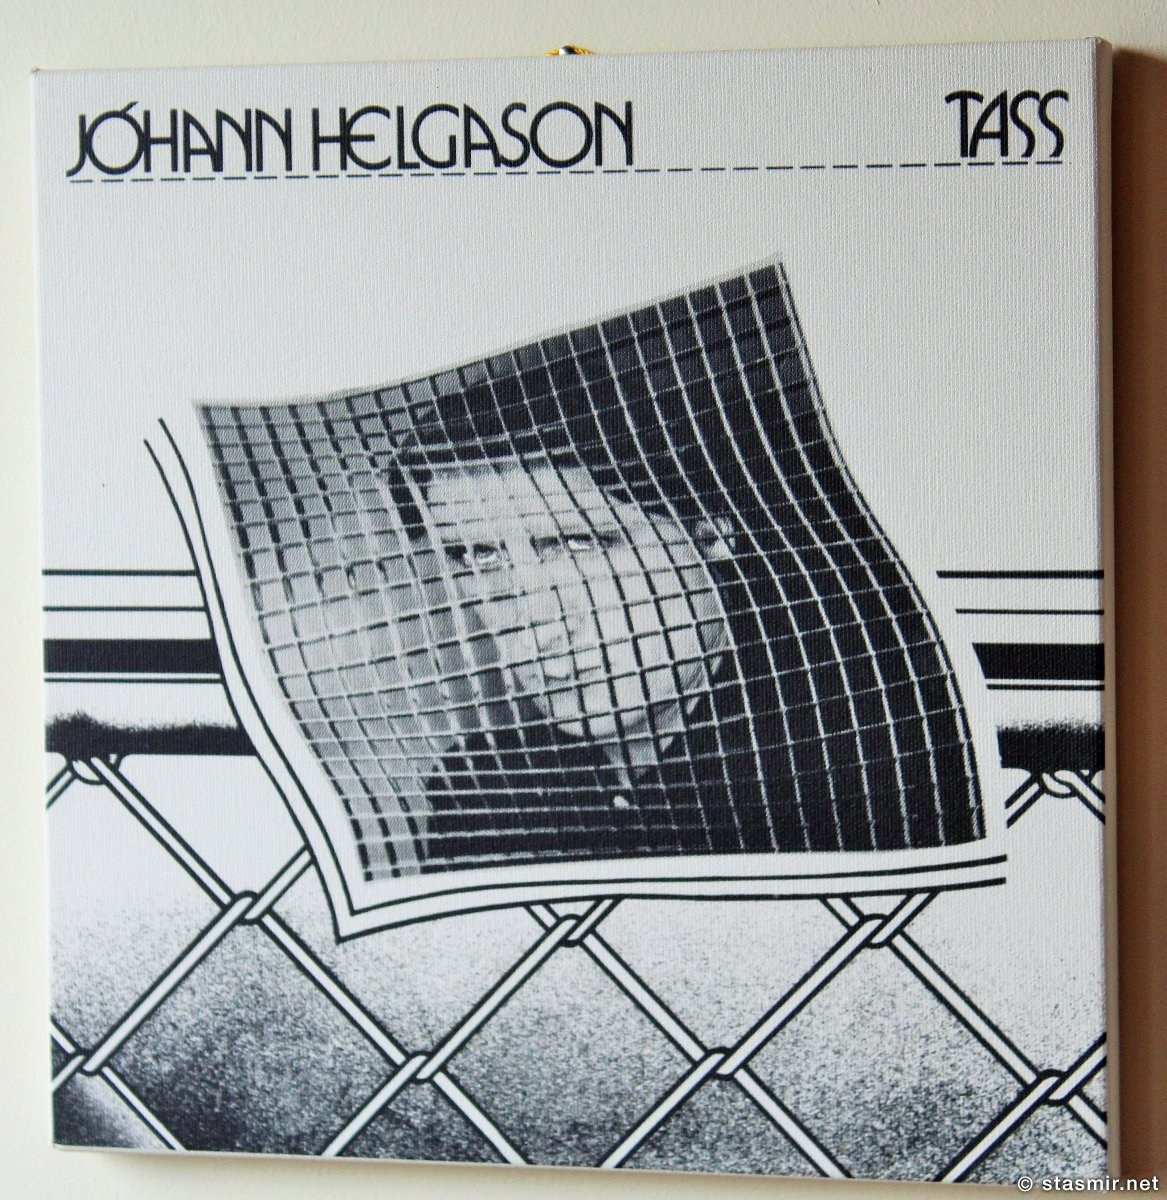 Jóhann Helgason, альбом Тасс, Troll-and-Roll в районе Борганес, фото Стасмир, photo Stasmir, Troll\'n\'Roll